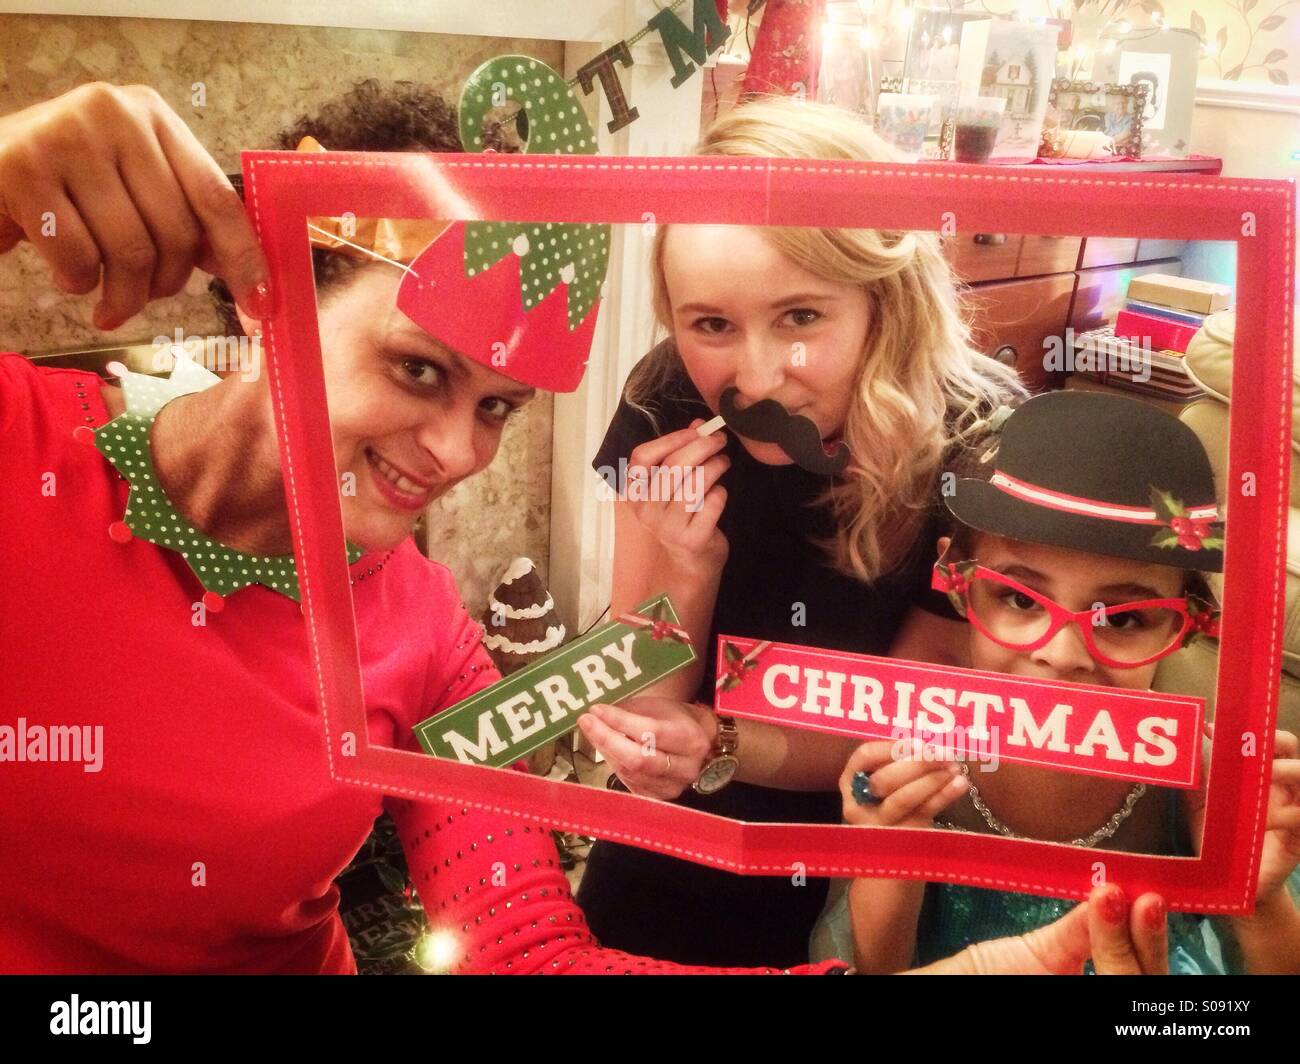 Merry Christmas! - Stock Image